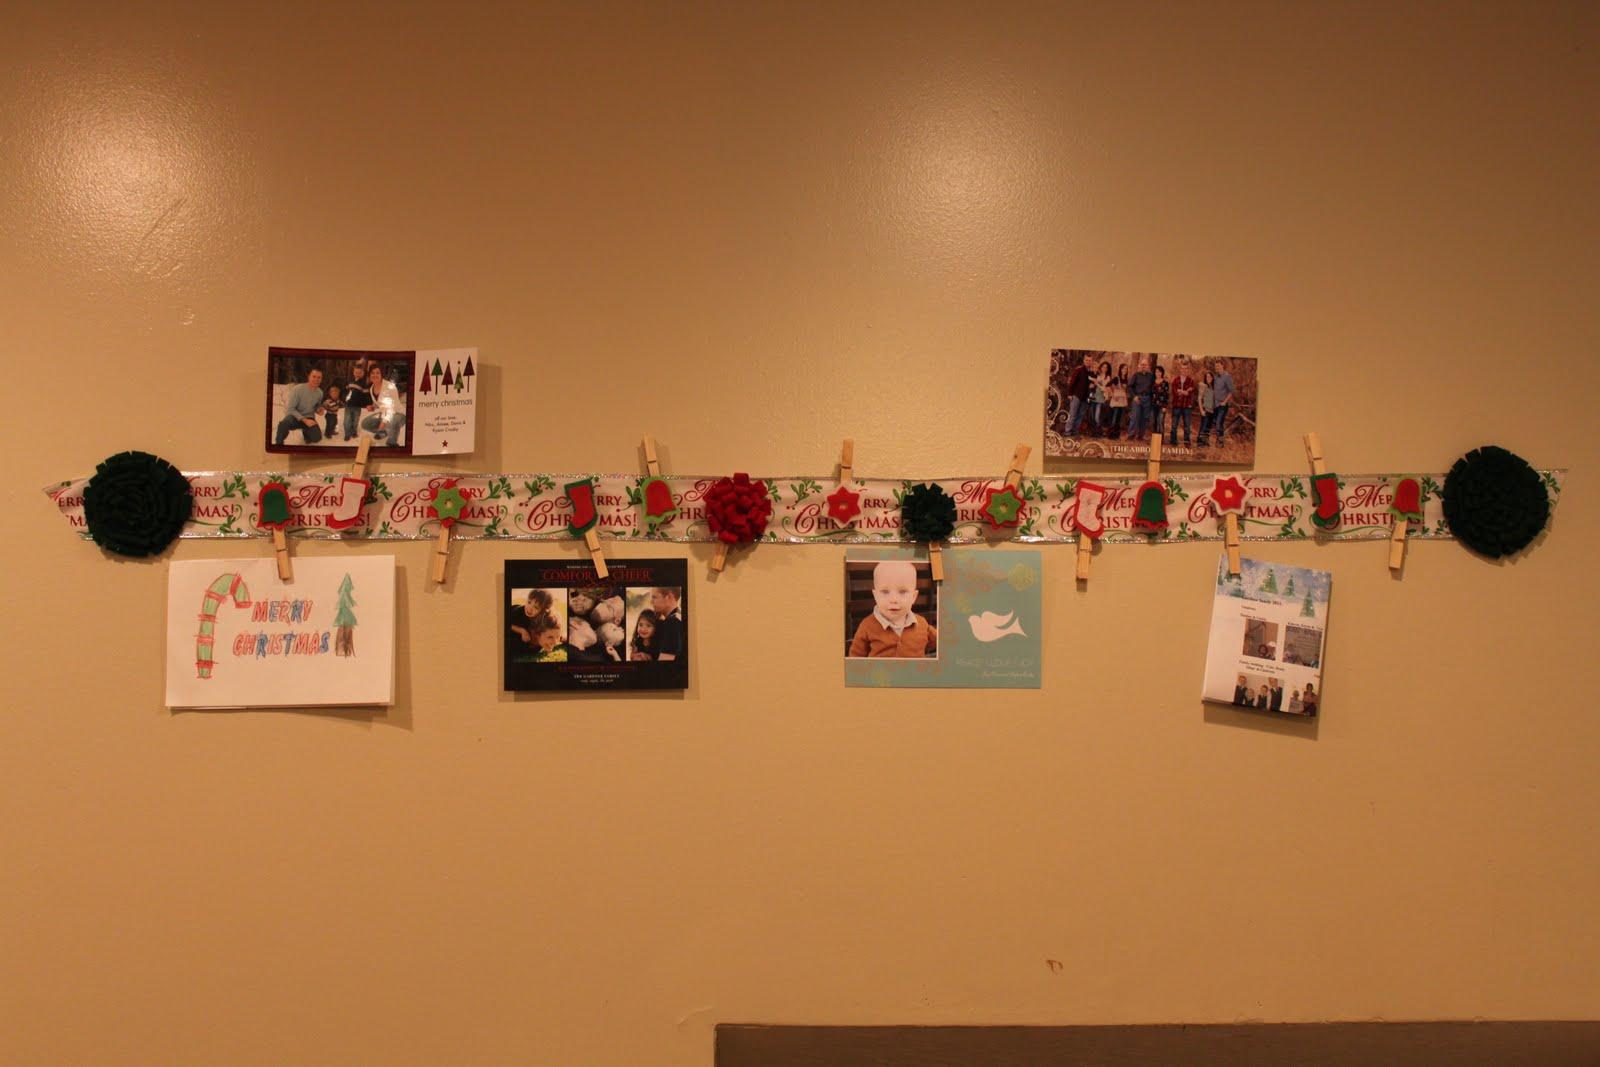 Wall Christmas Card Holder Credainatcon